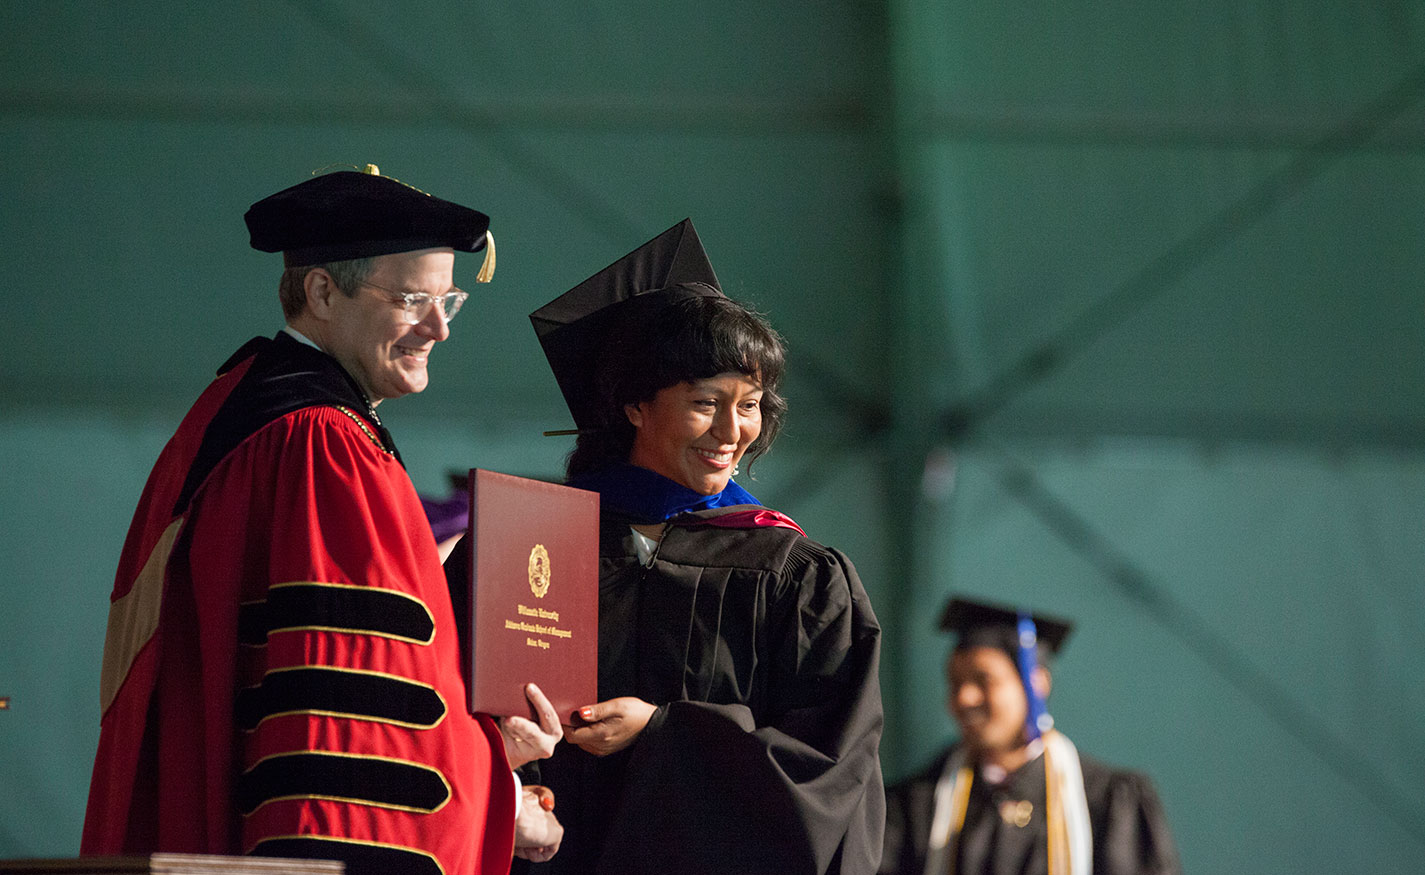 2016 Willamette MBA Global Diversity Scholarship